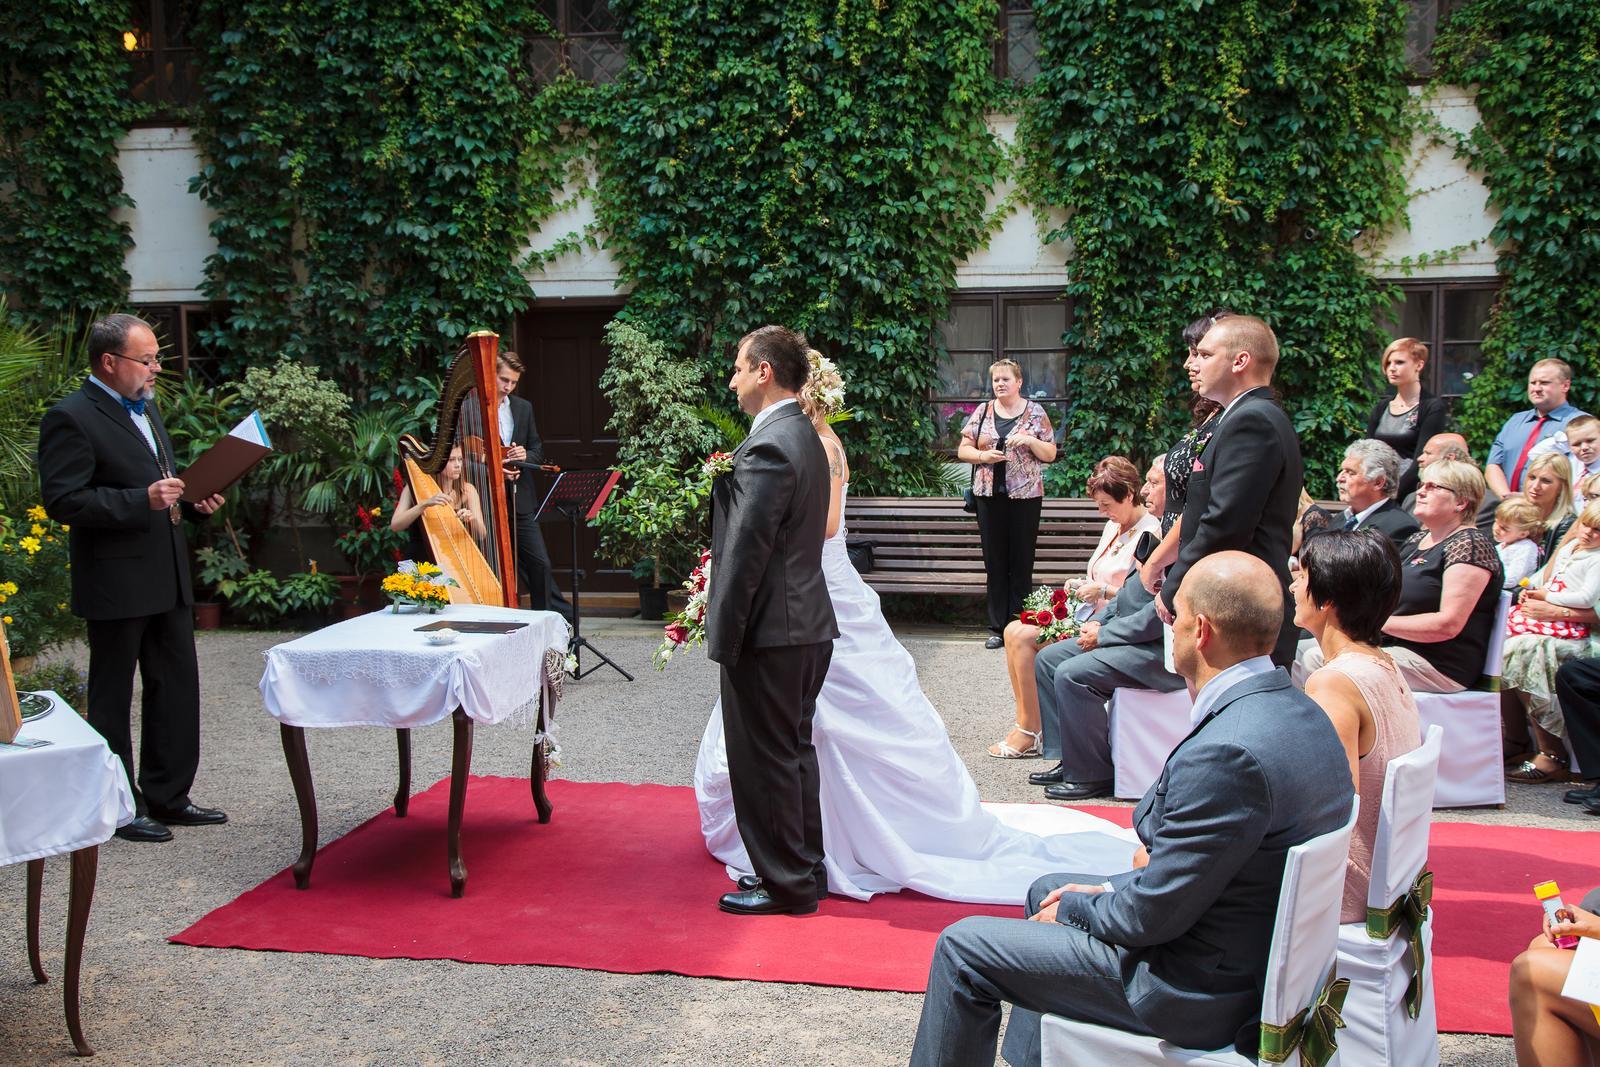 harfistka_simona - Svatba 6.8.2016 - Zámek Slatiňany